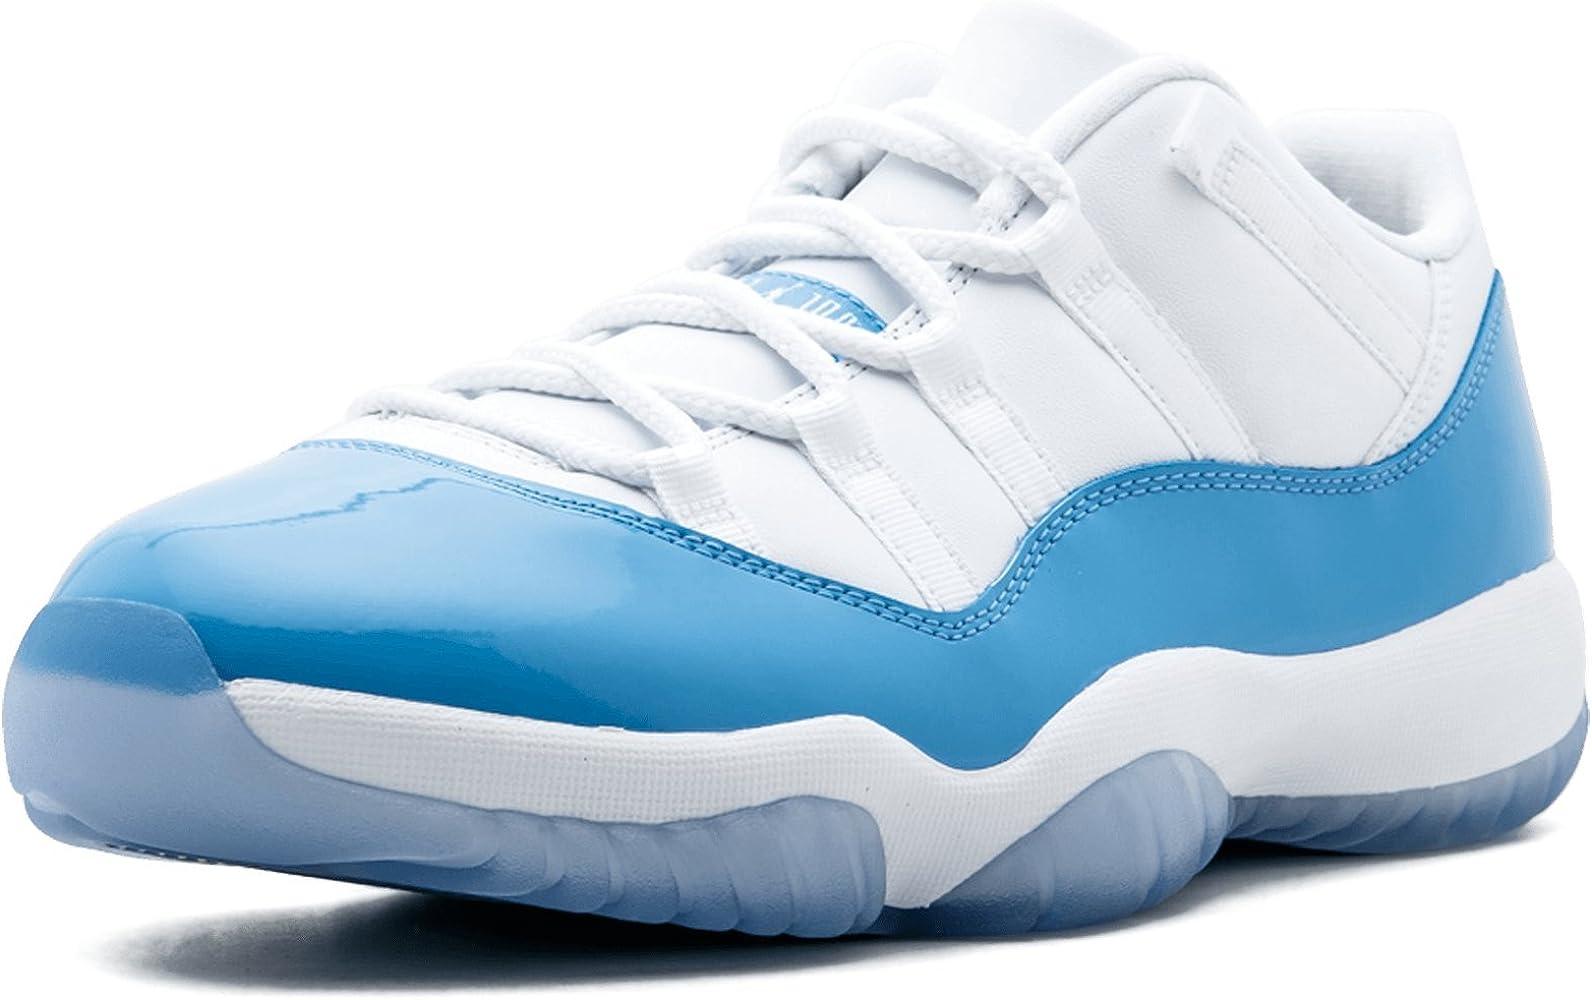 timeless design acb72 12d56 Men Air Jordan 11 Retro Low (White/University Blue) Size 9.5 US